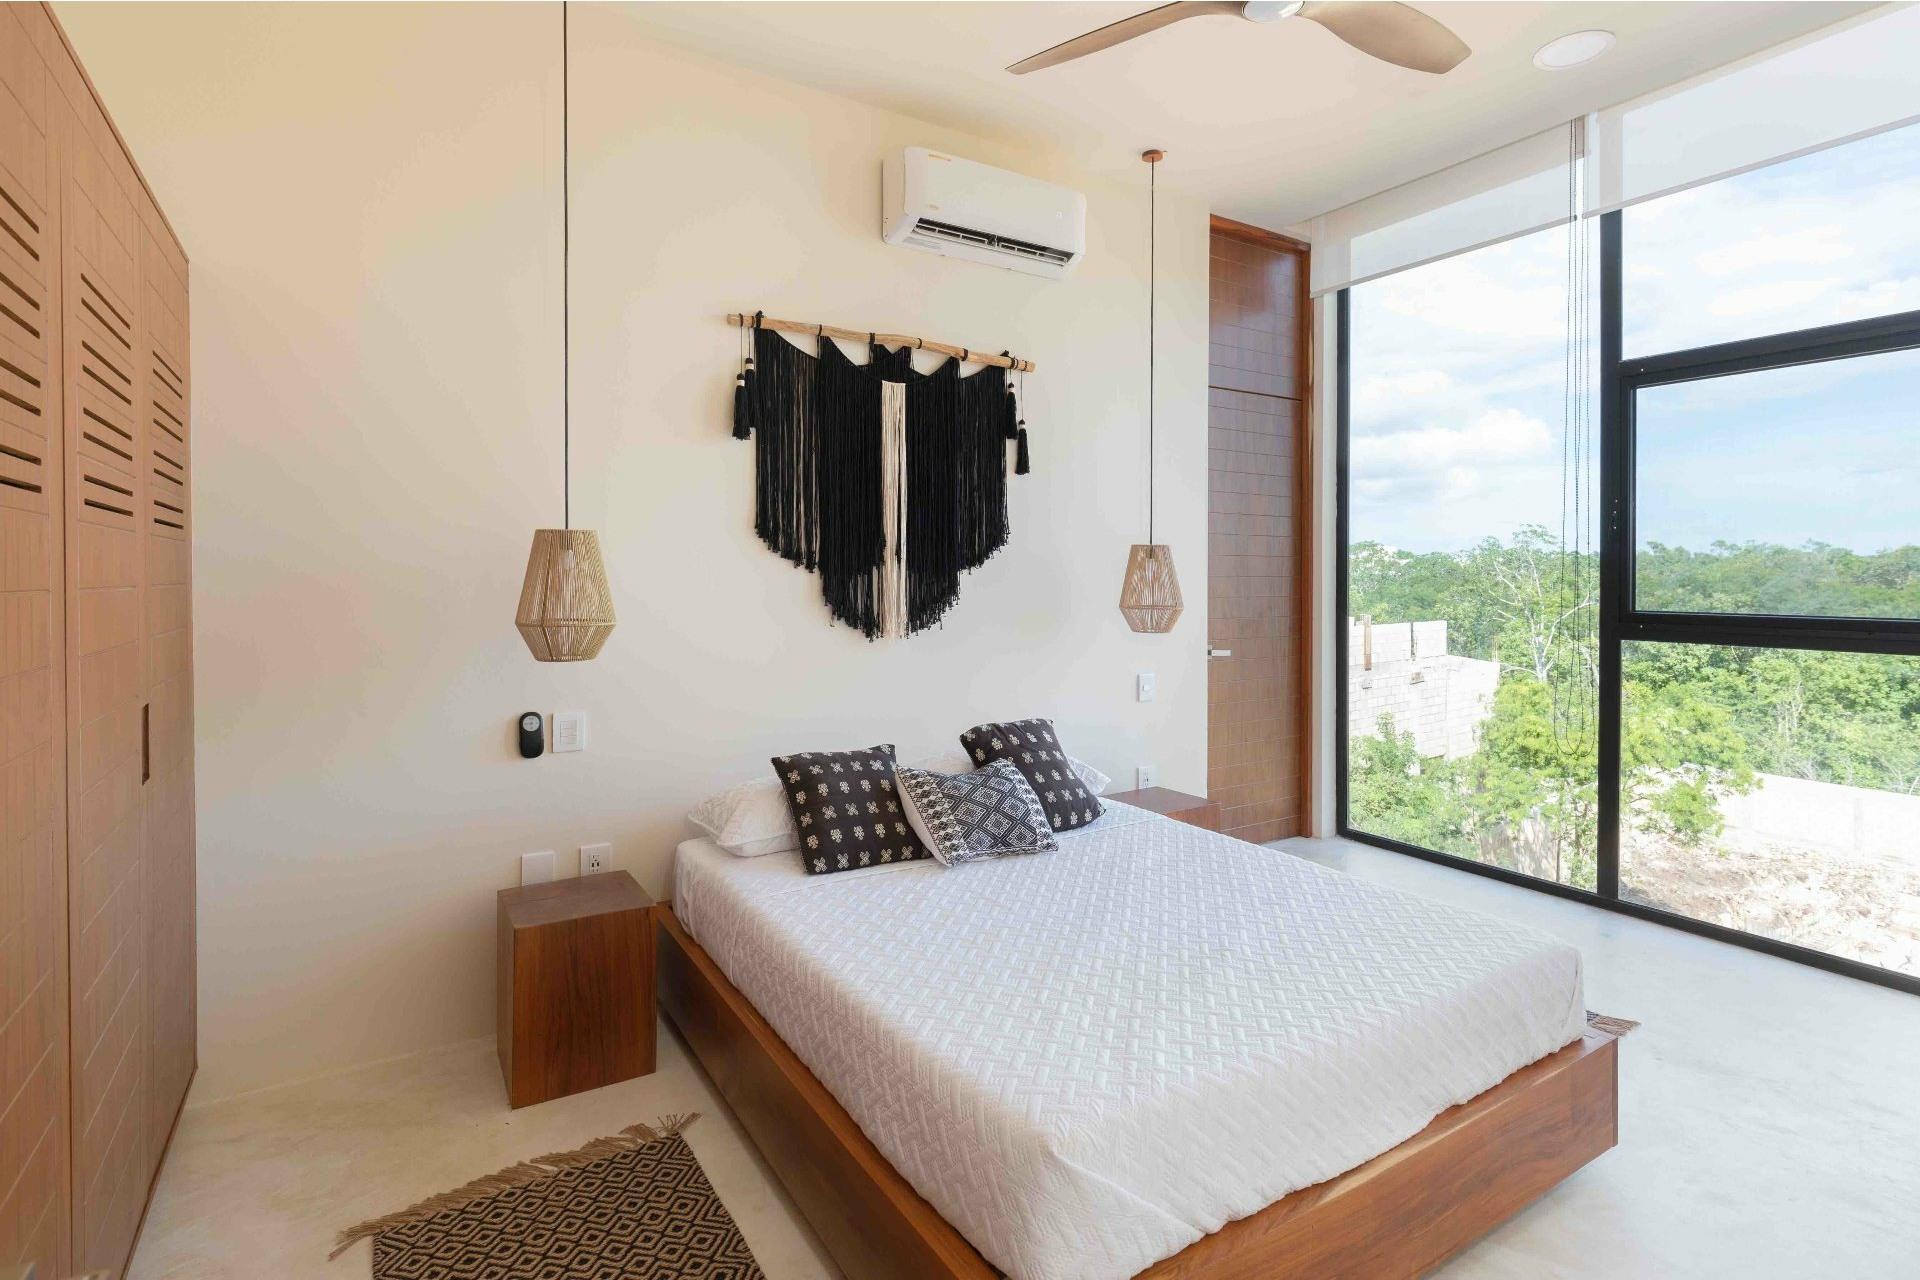 image 3 - Apartment For sale Autres pays - 7 rooms